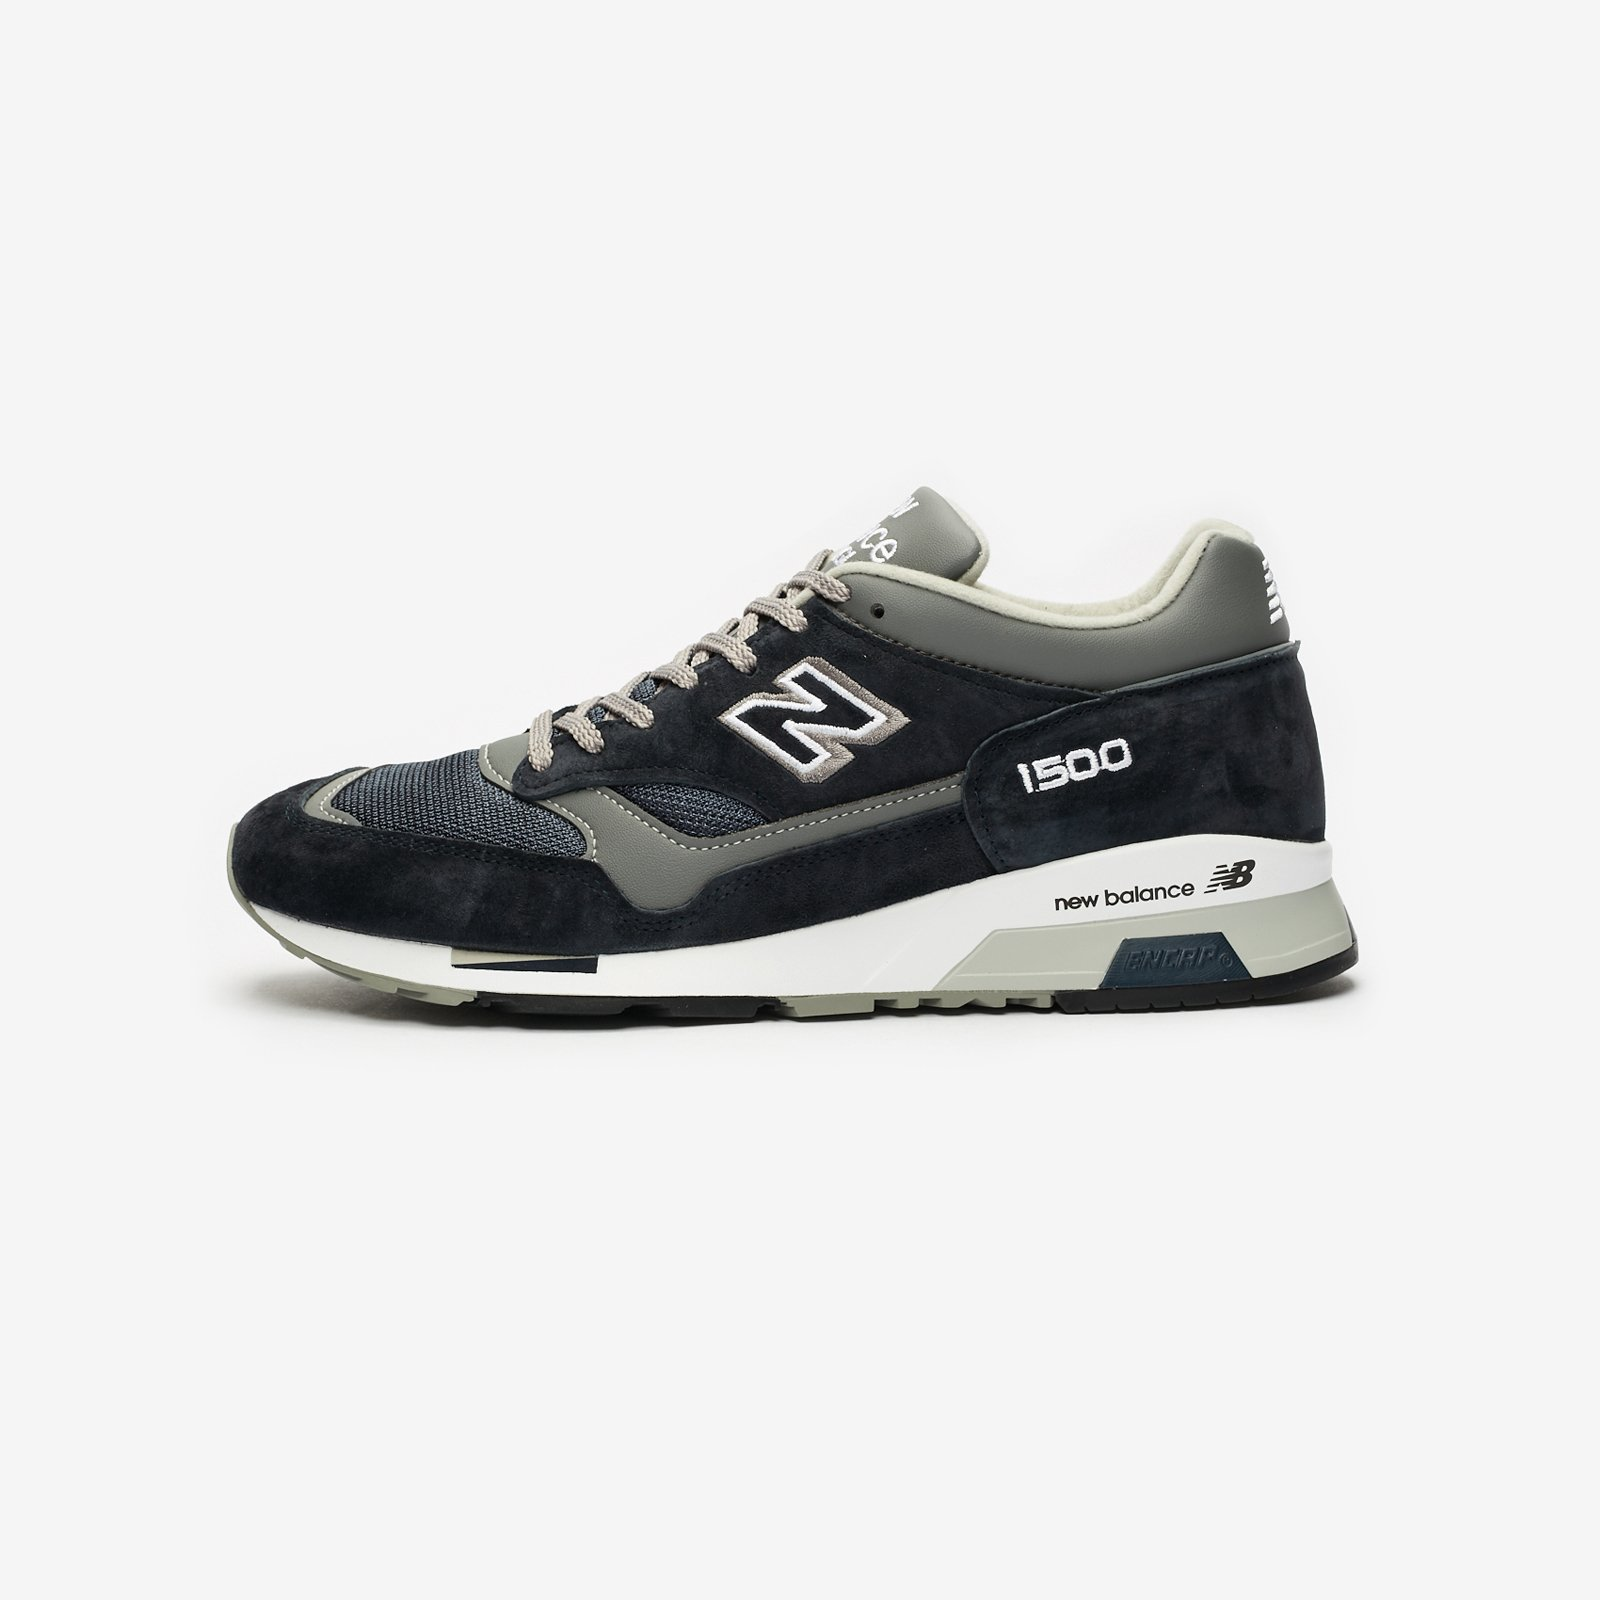 New Balance M1500 - M1500pnv - Sneakersnstuff | sneakers ...